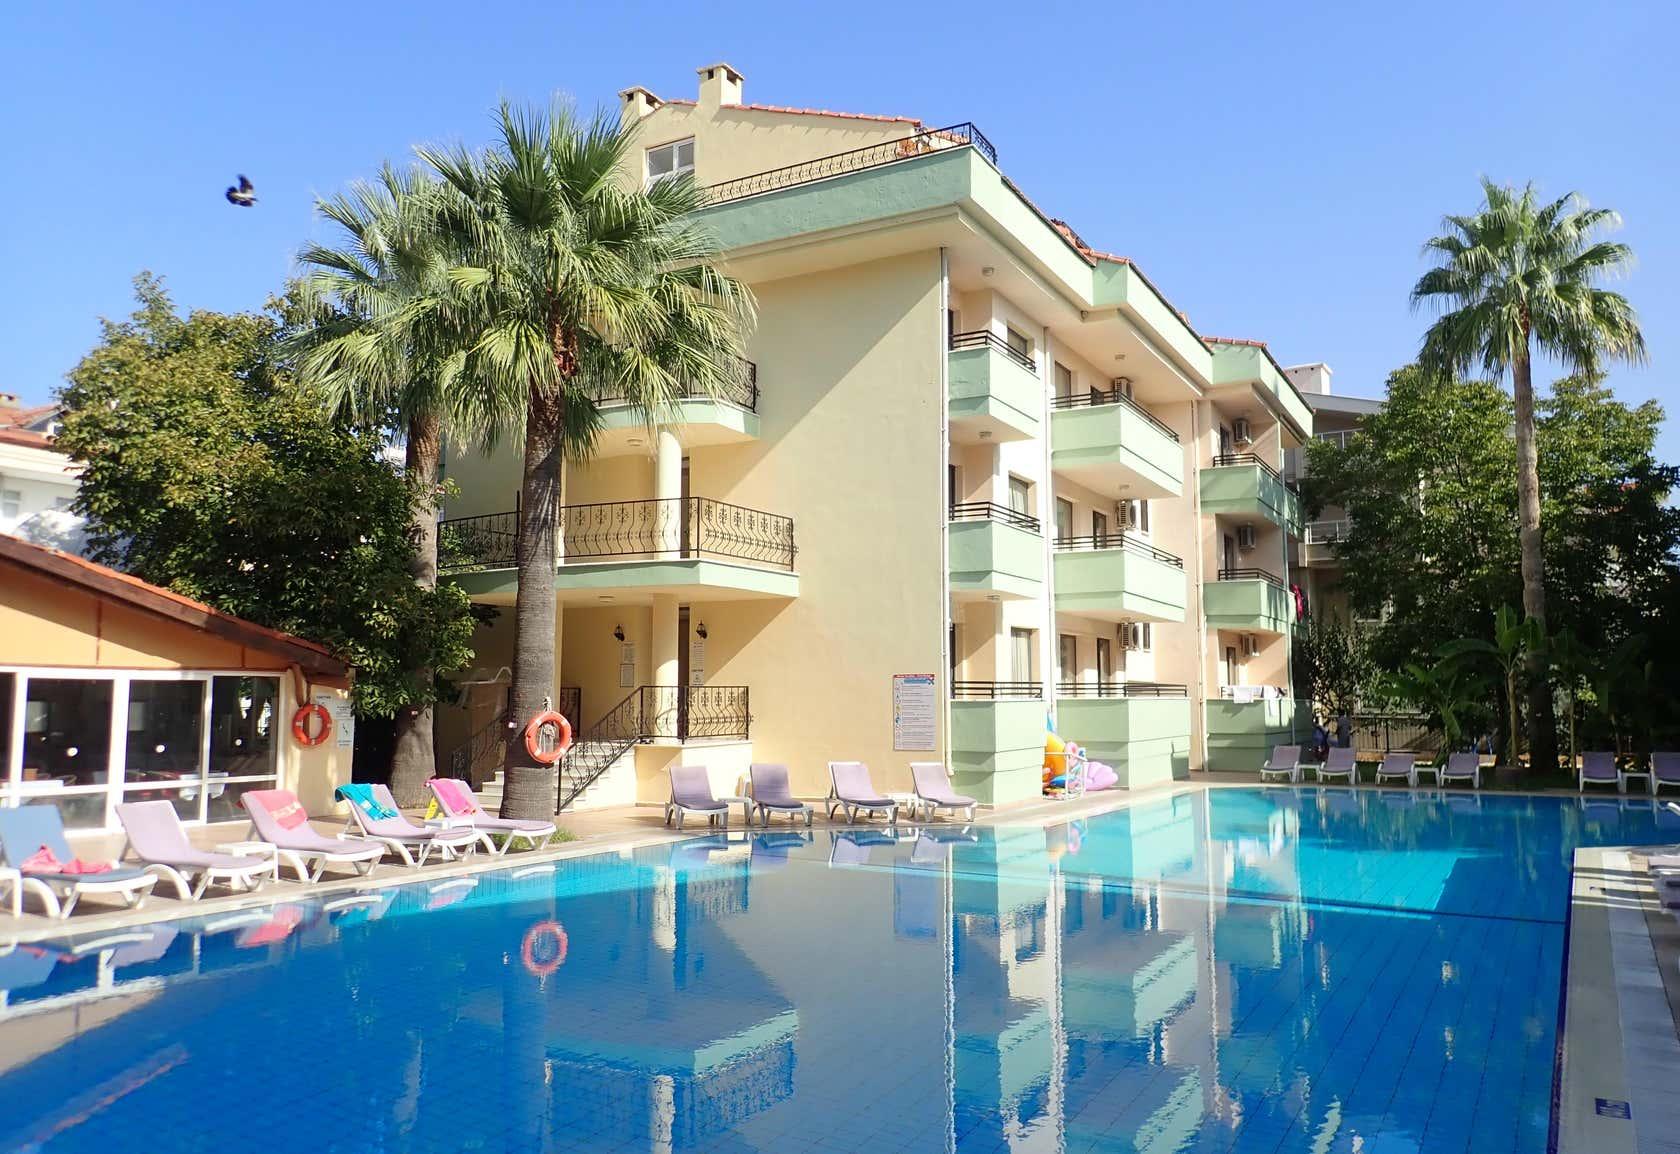 Club Palm Garden - Keskin Hotel & Apartments